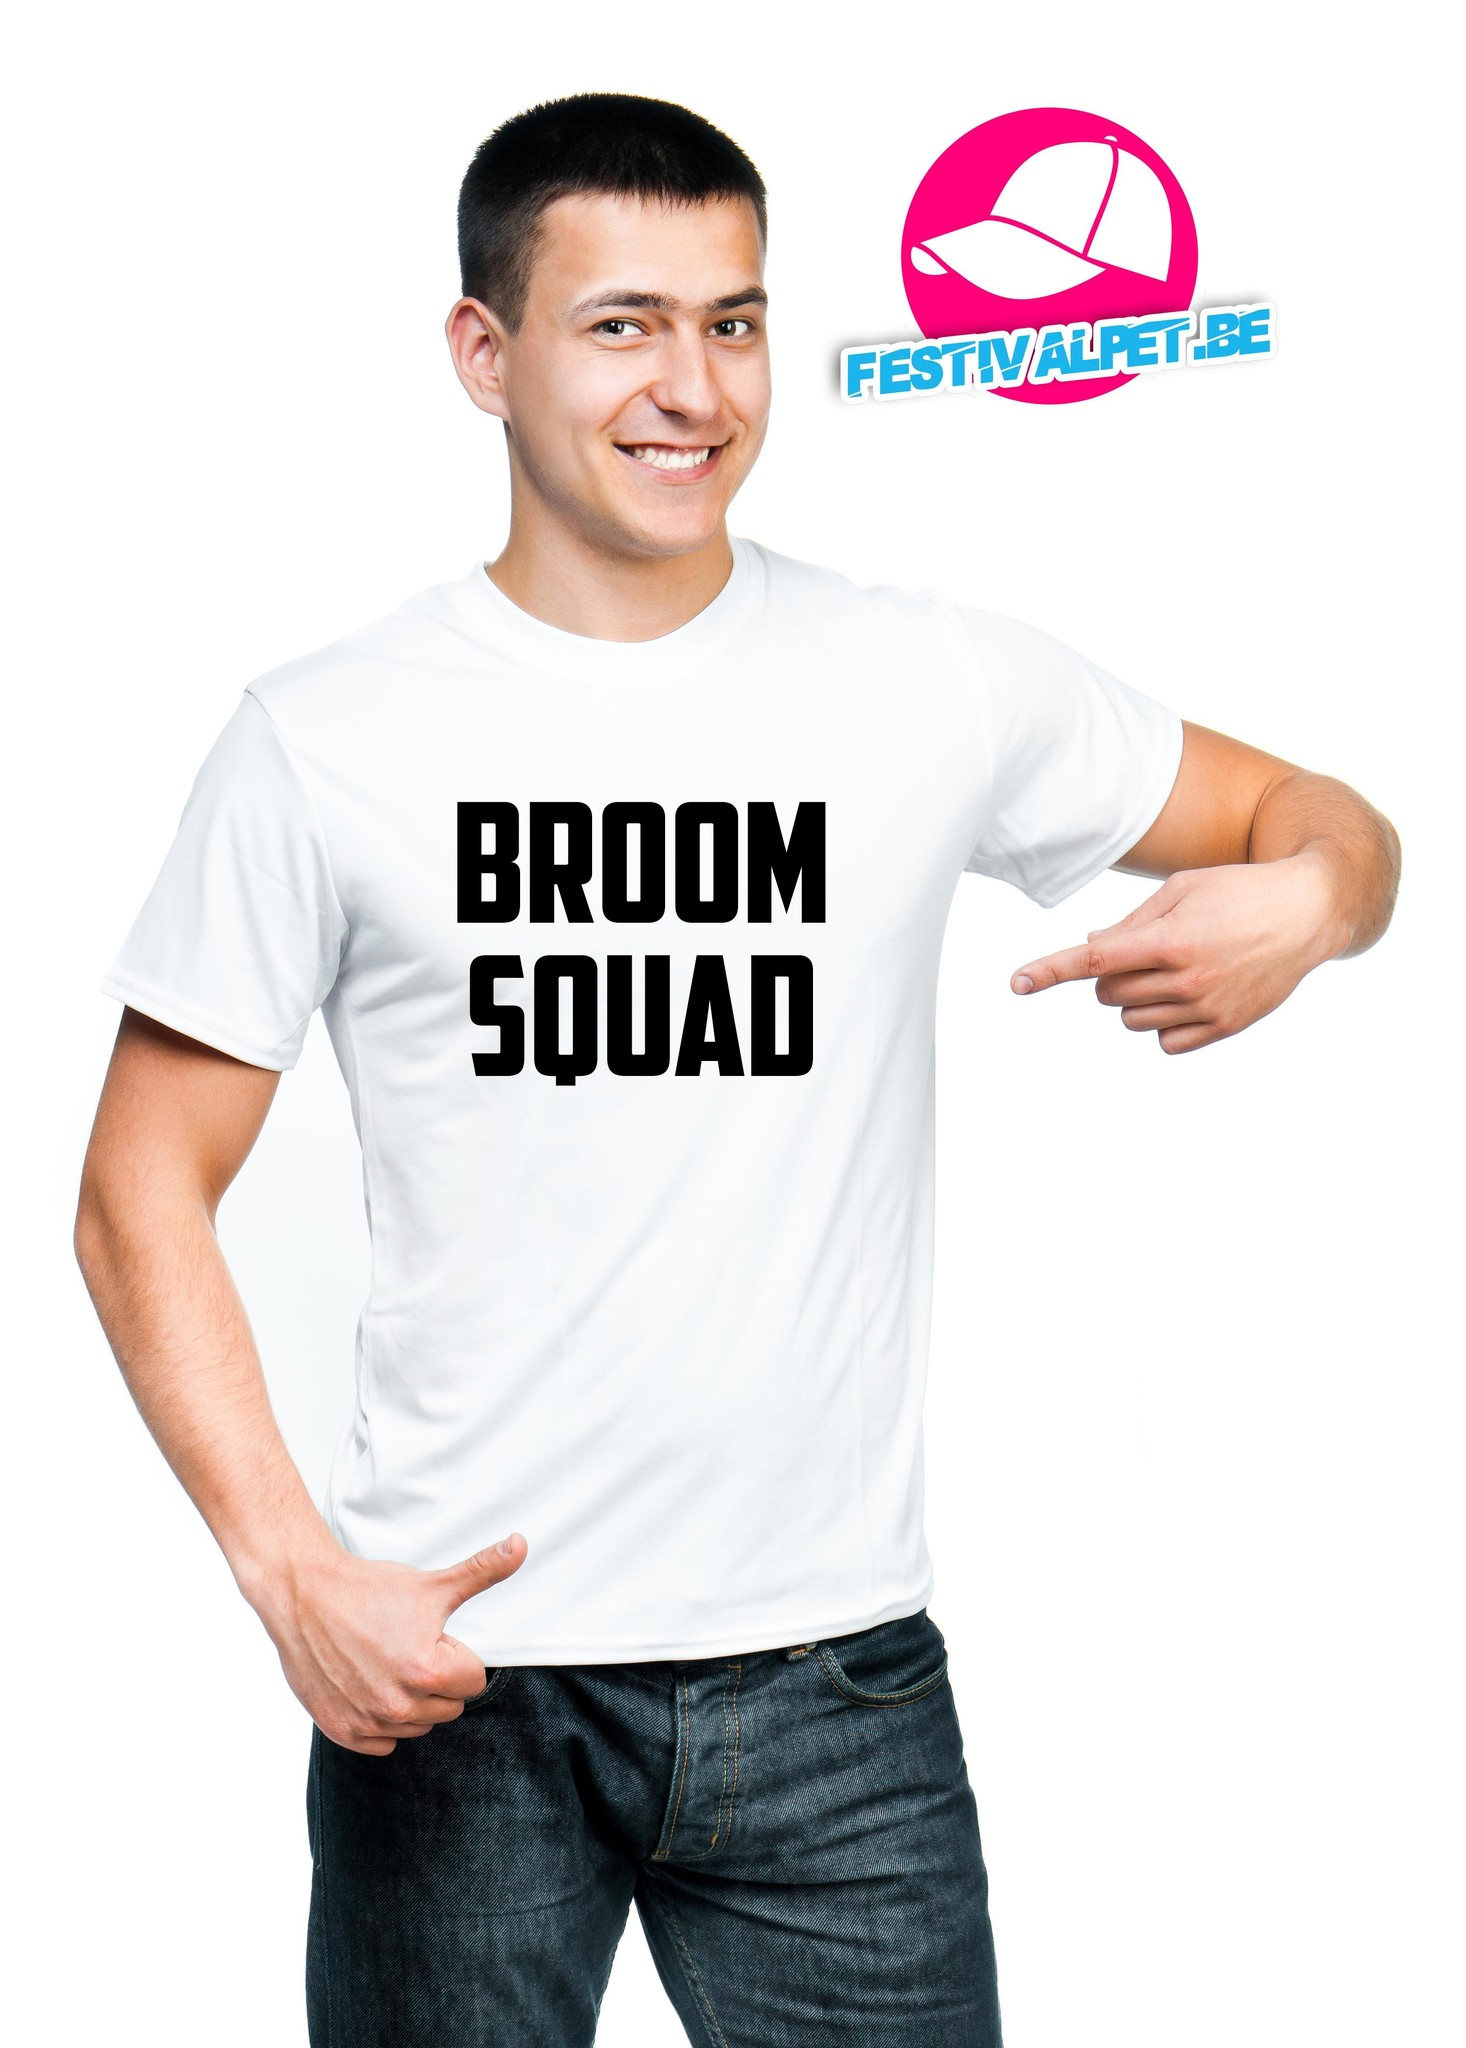 Broom Squad